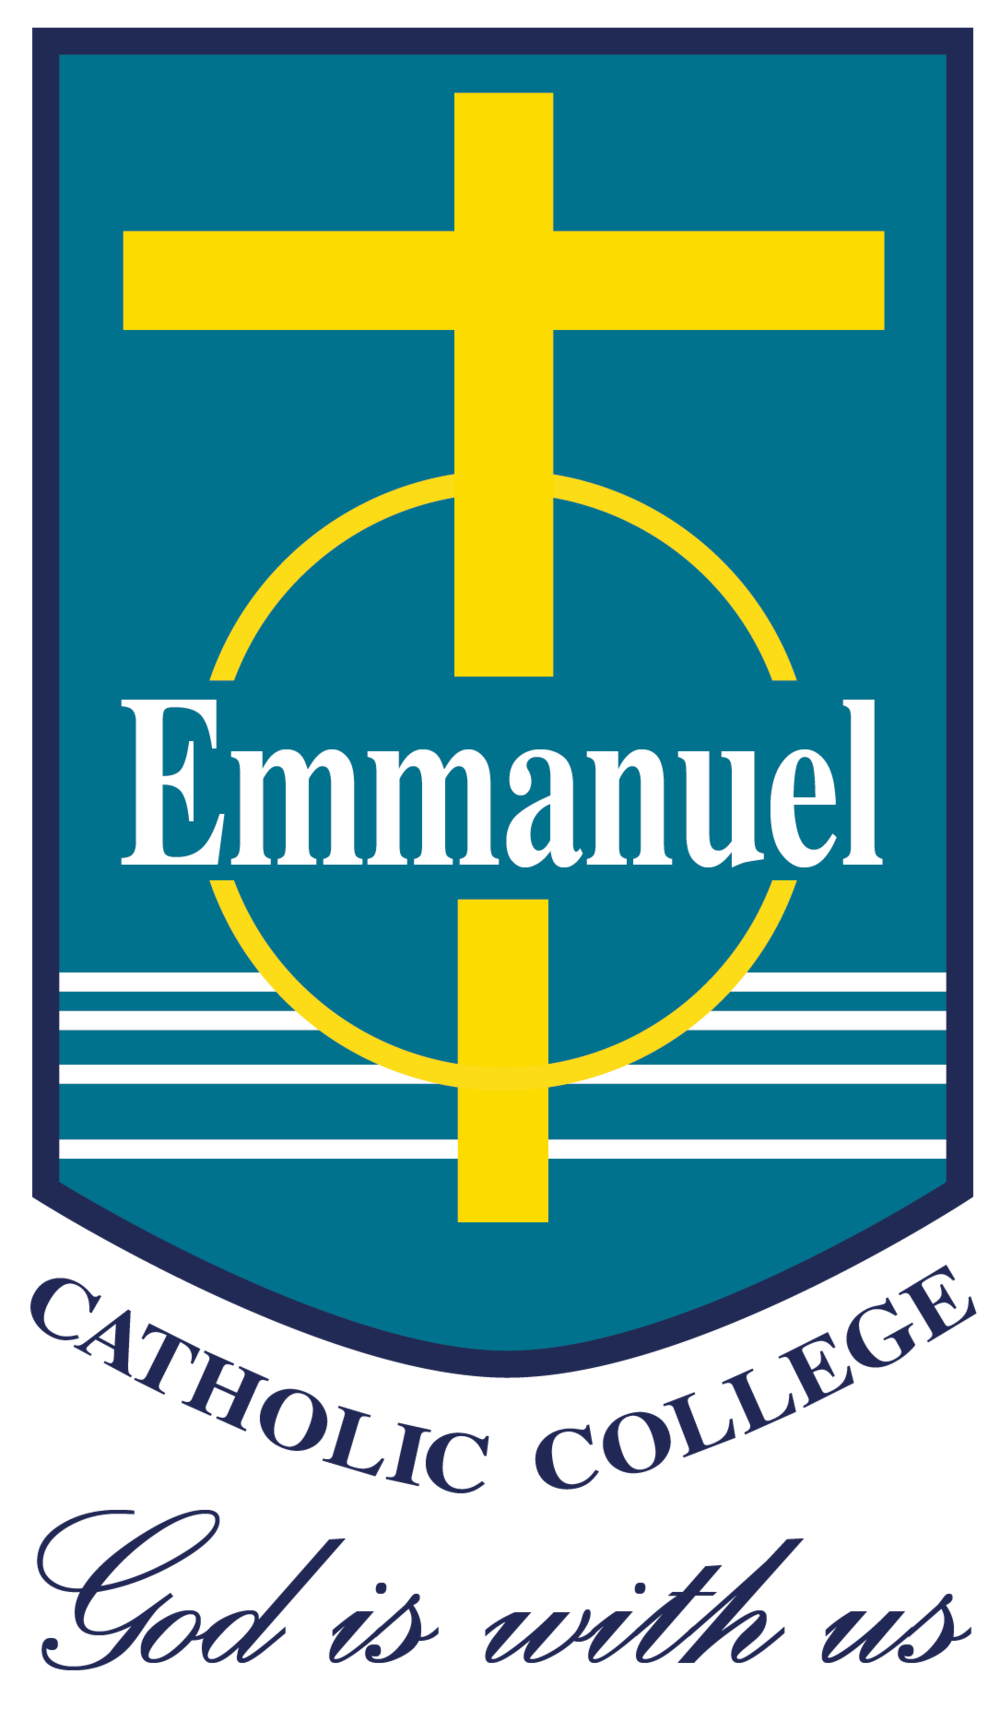 2Emmanuel Catholic College.png